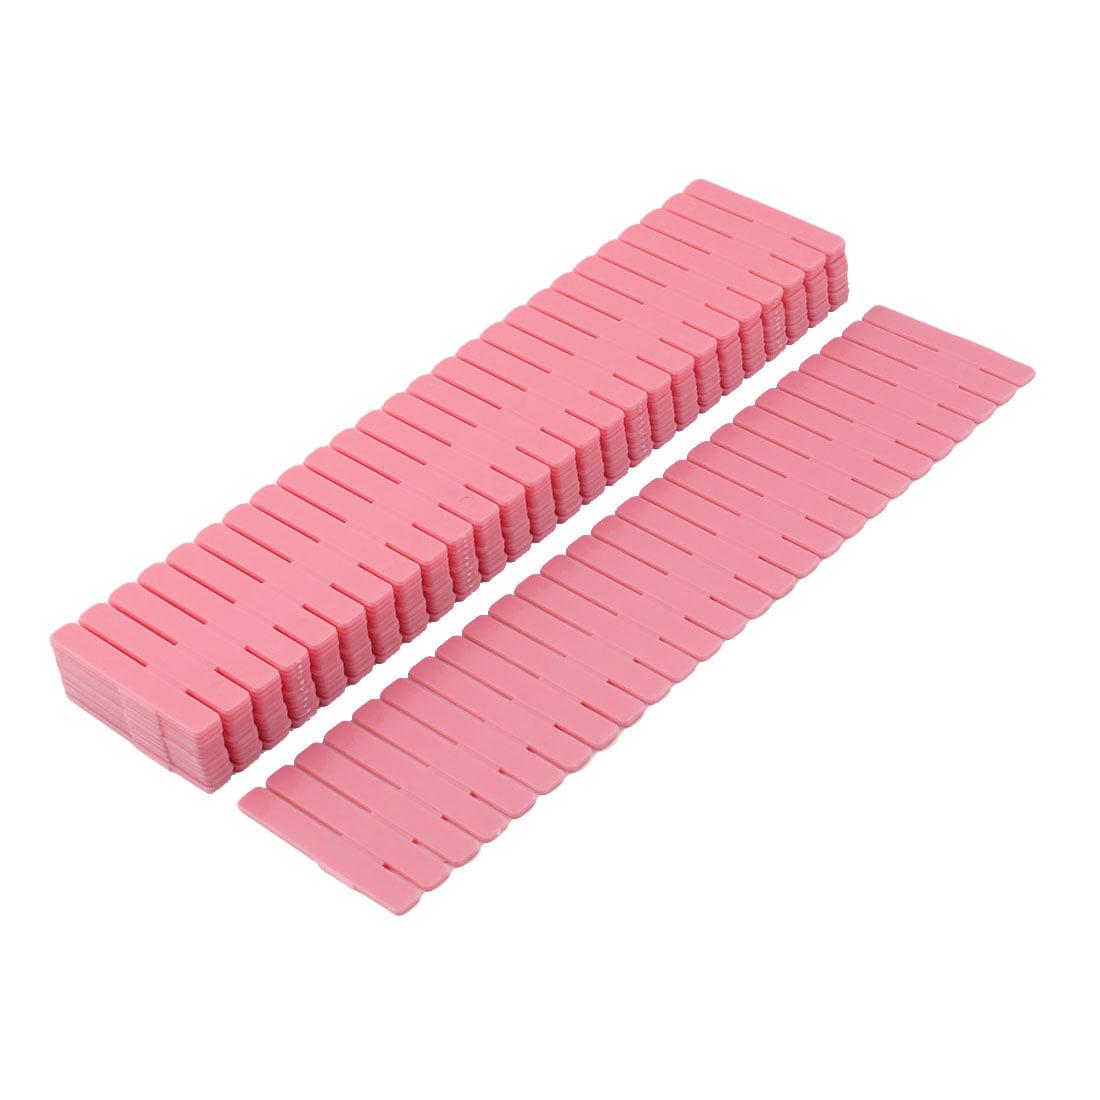 Household Plastic Adjustable Separator Long DIY Drawer Dividers Pink 12 Pcs